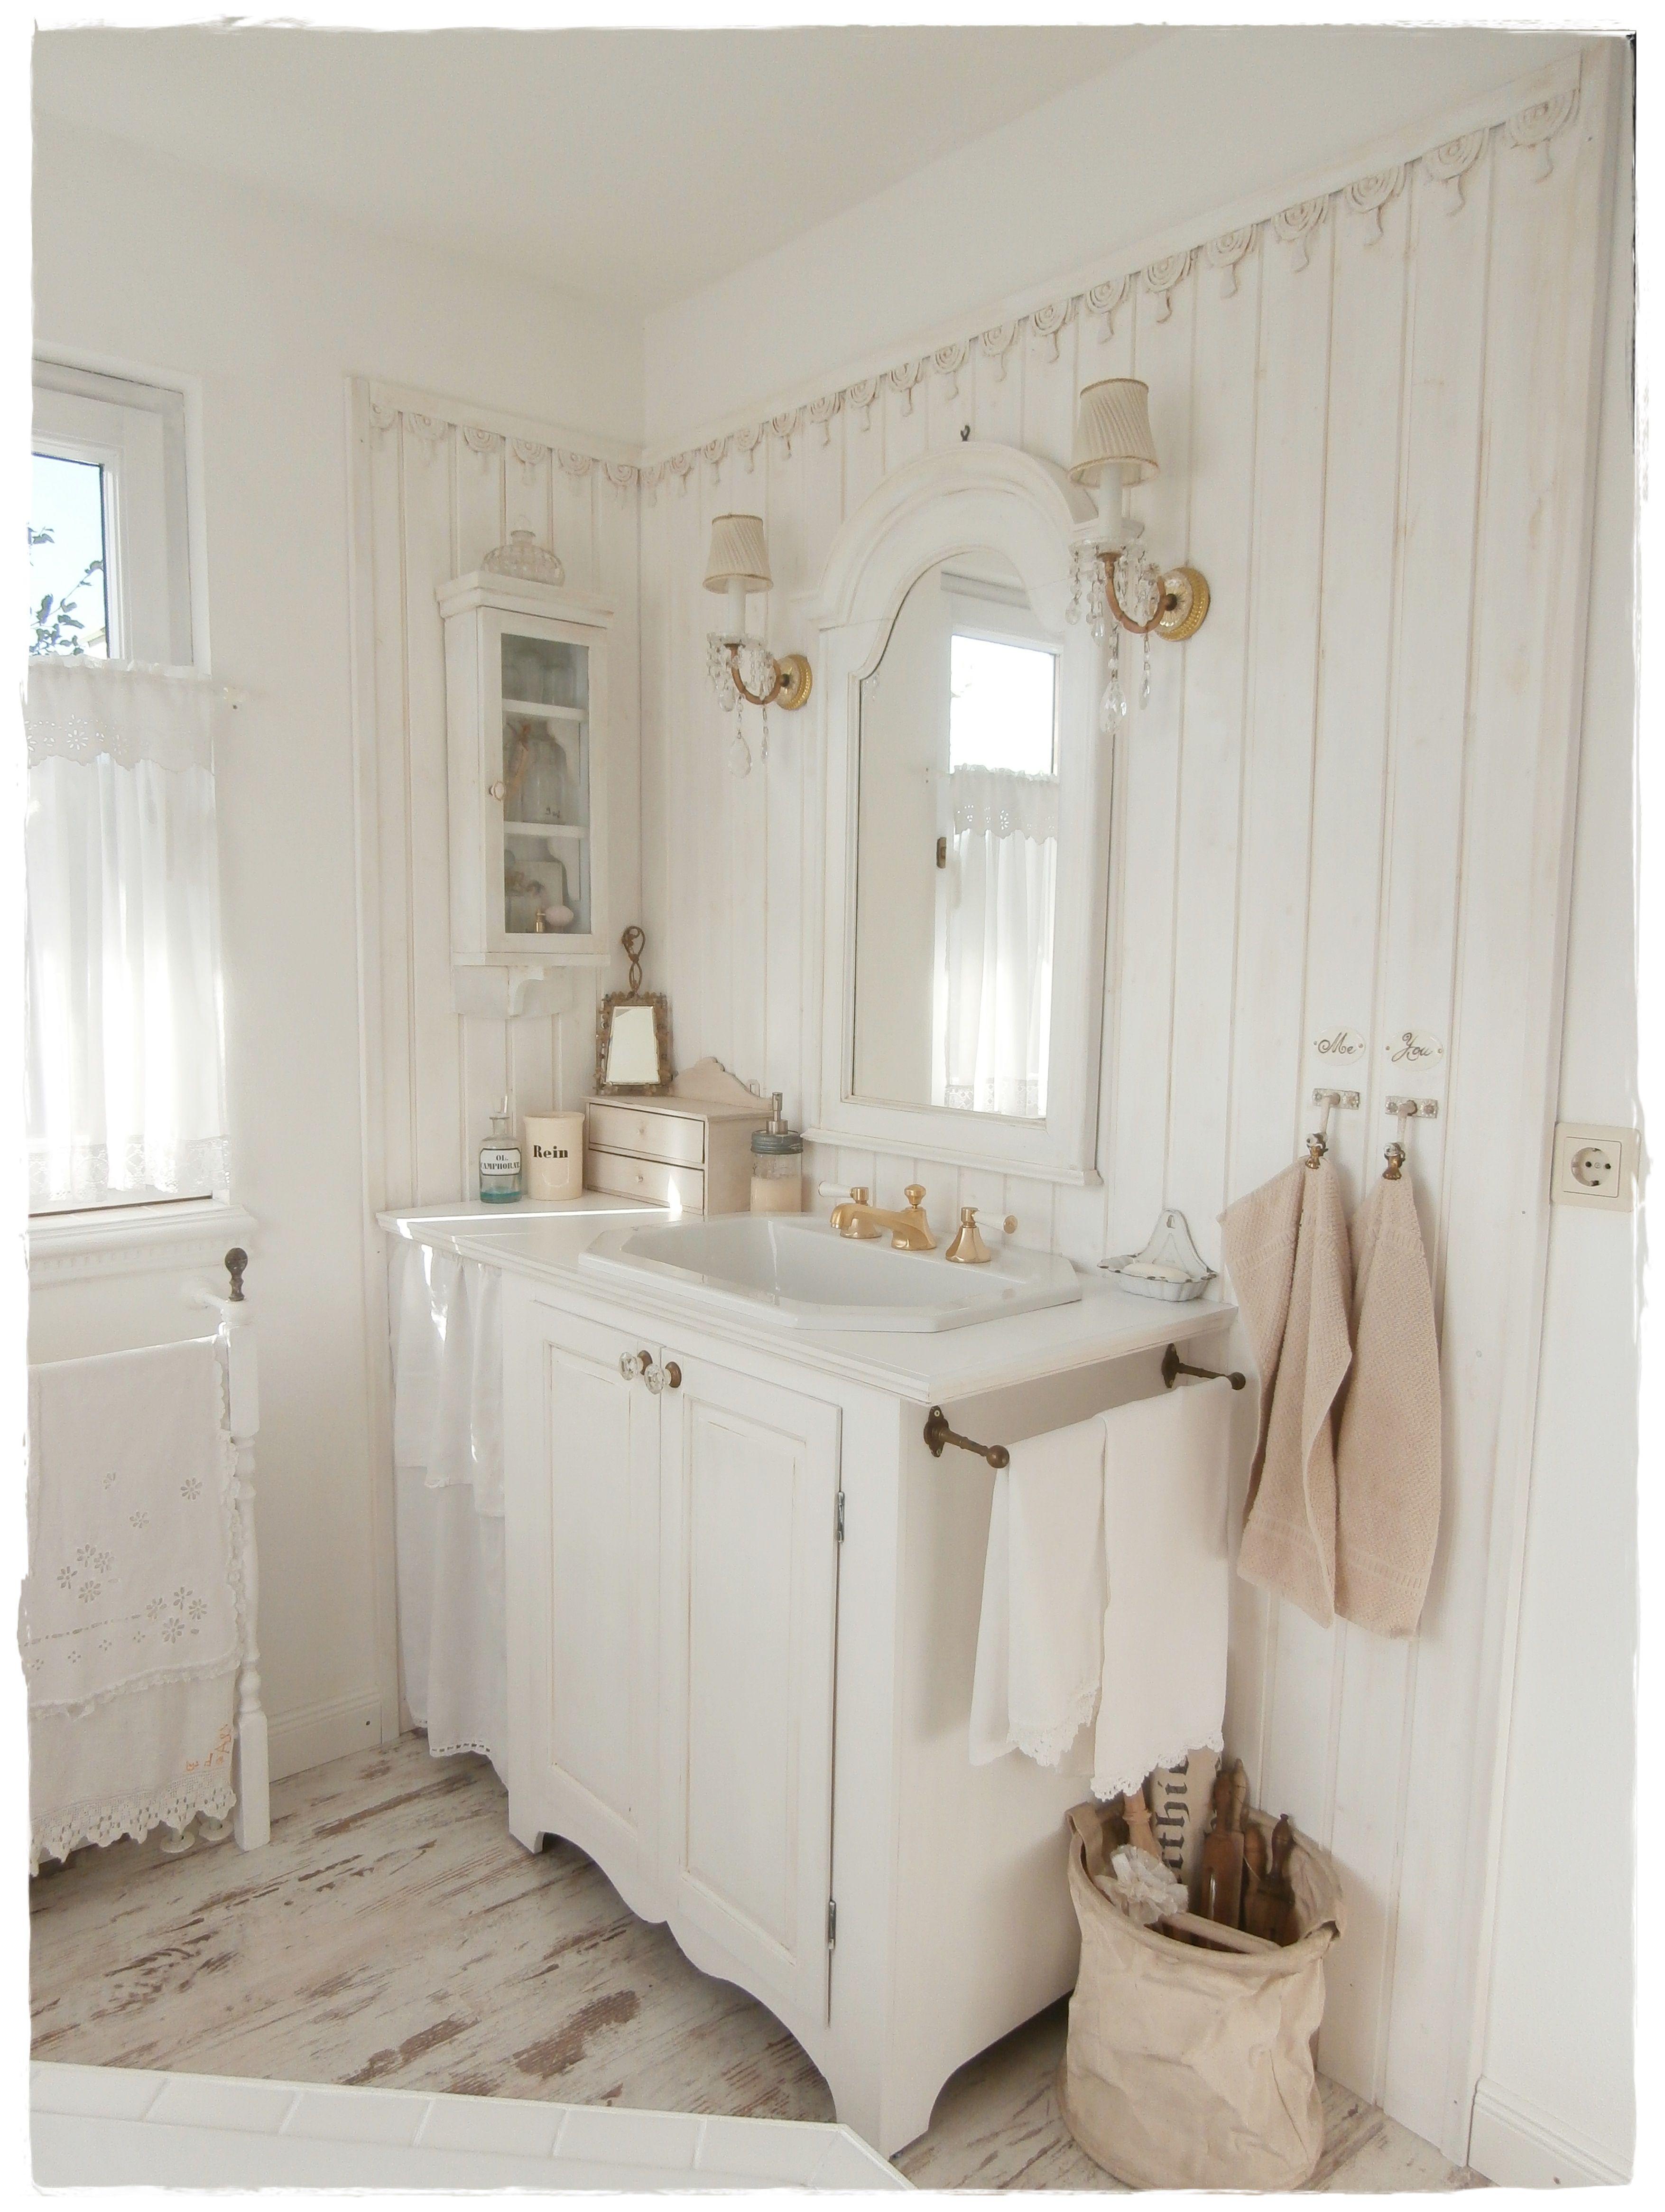 Bathroom Shabby Chic And White Shabby Chic Zimmer Shabby Chic Badezimmer Und Shabby Chic Dekoration